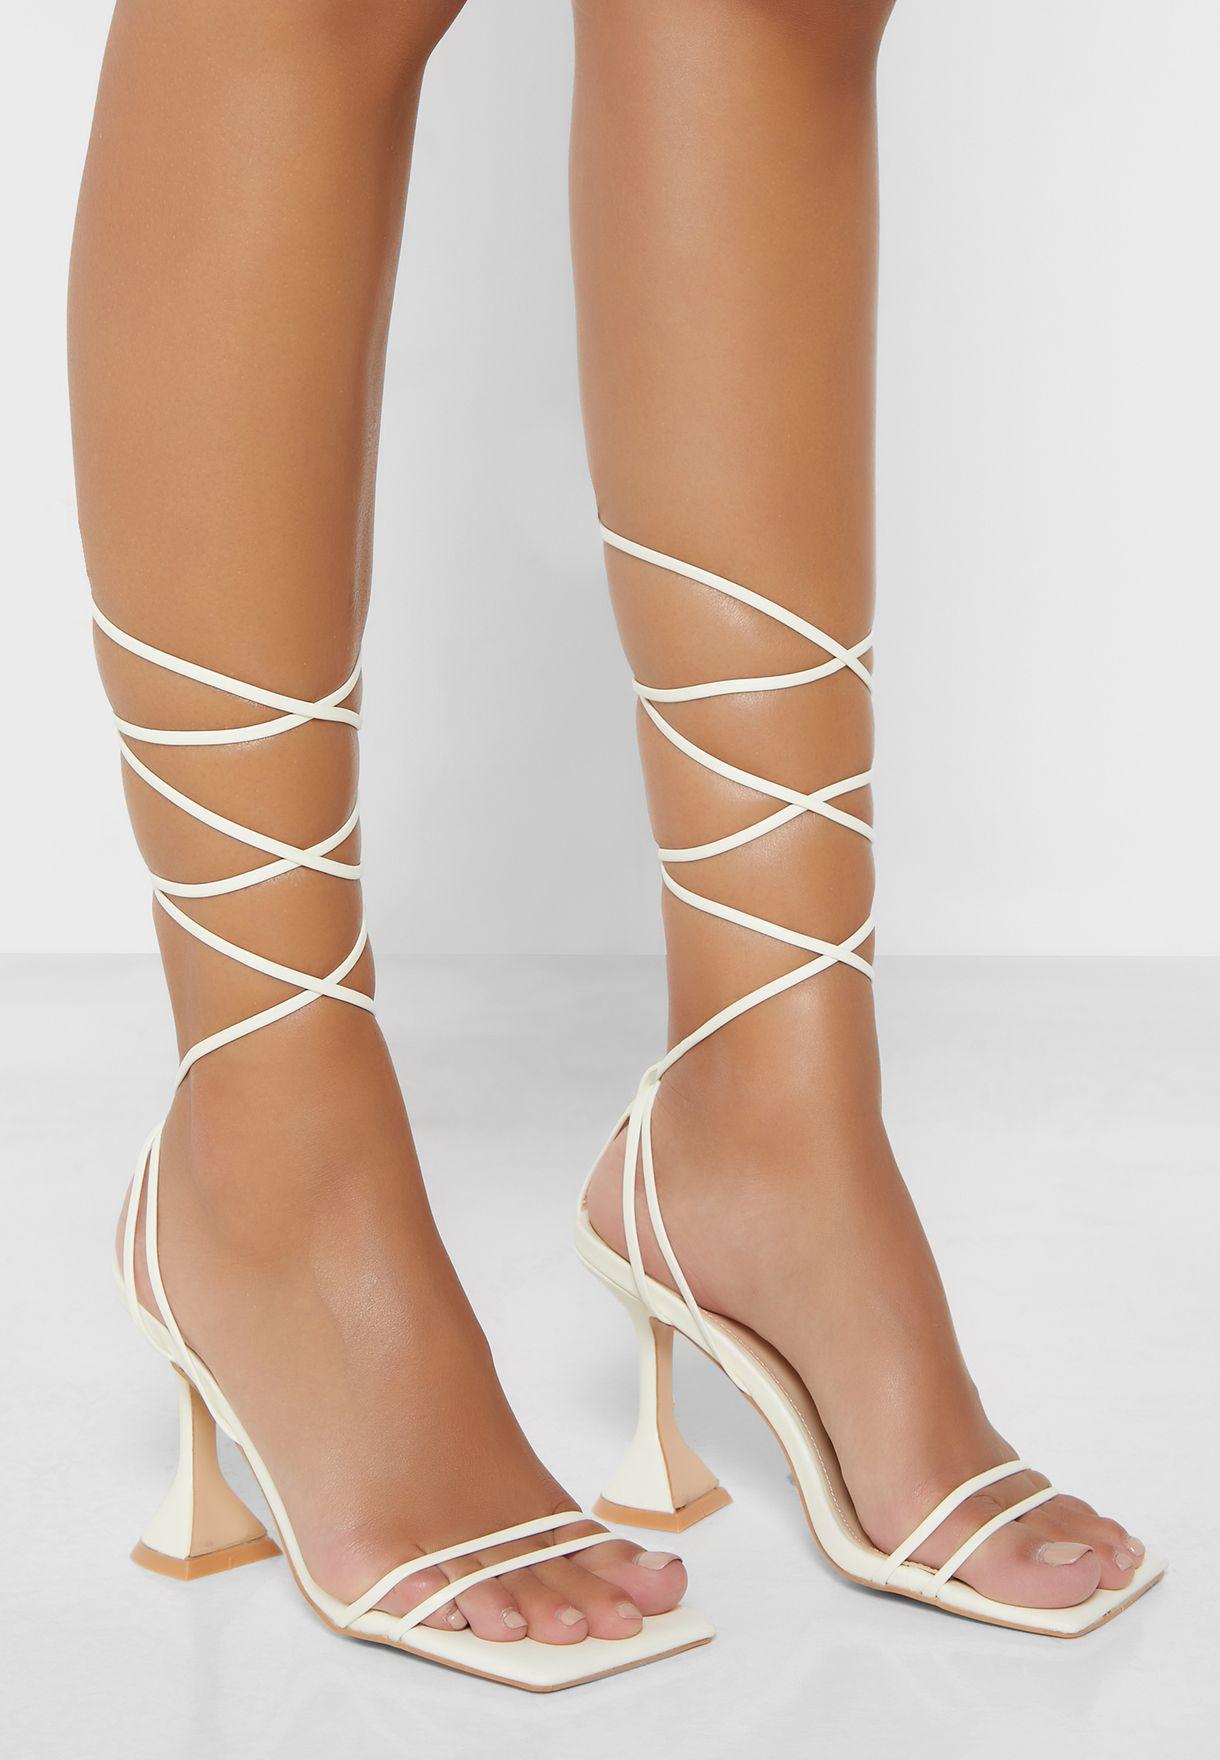 Dymond High Heel Sandal